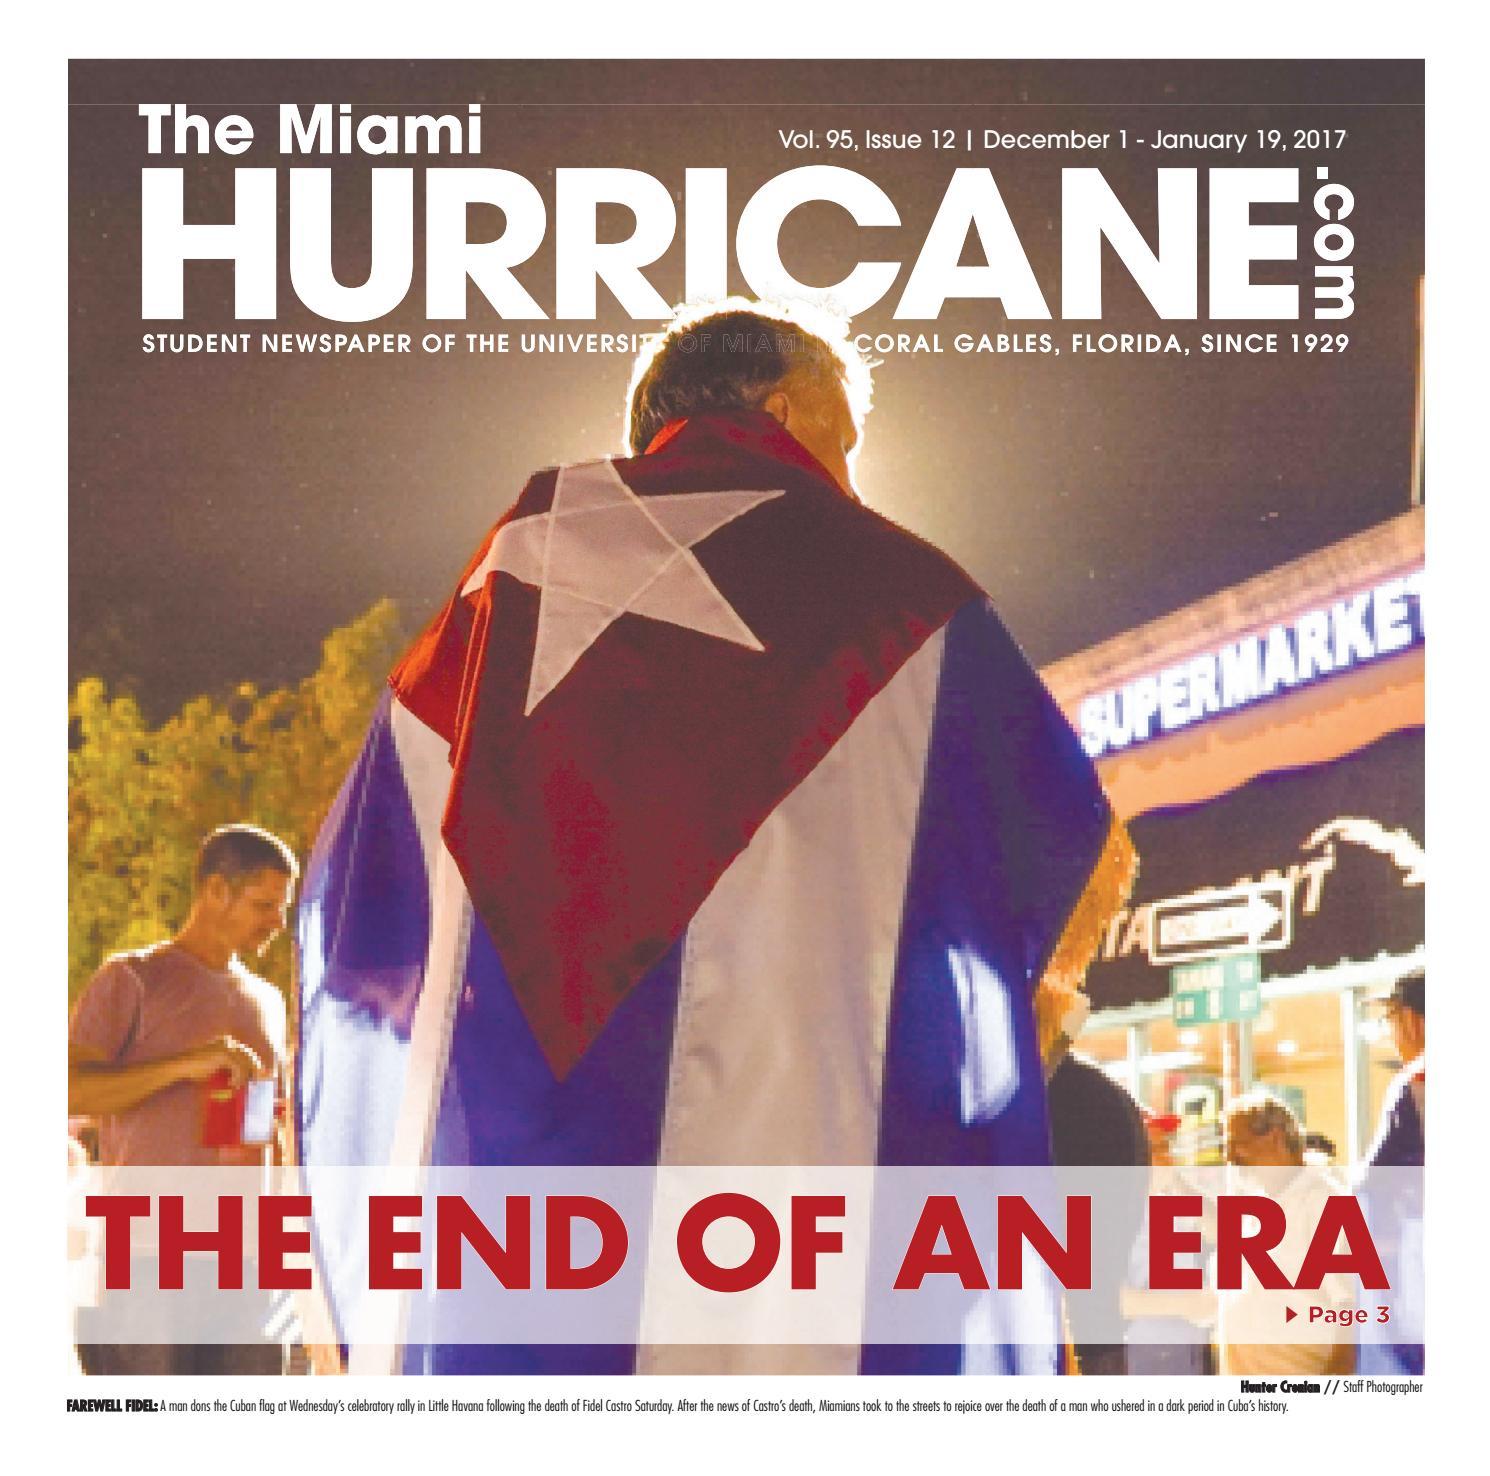 The Miami Hurricane - December 1, 2016 by The Miami